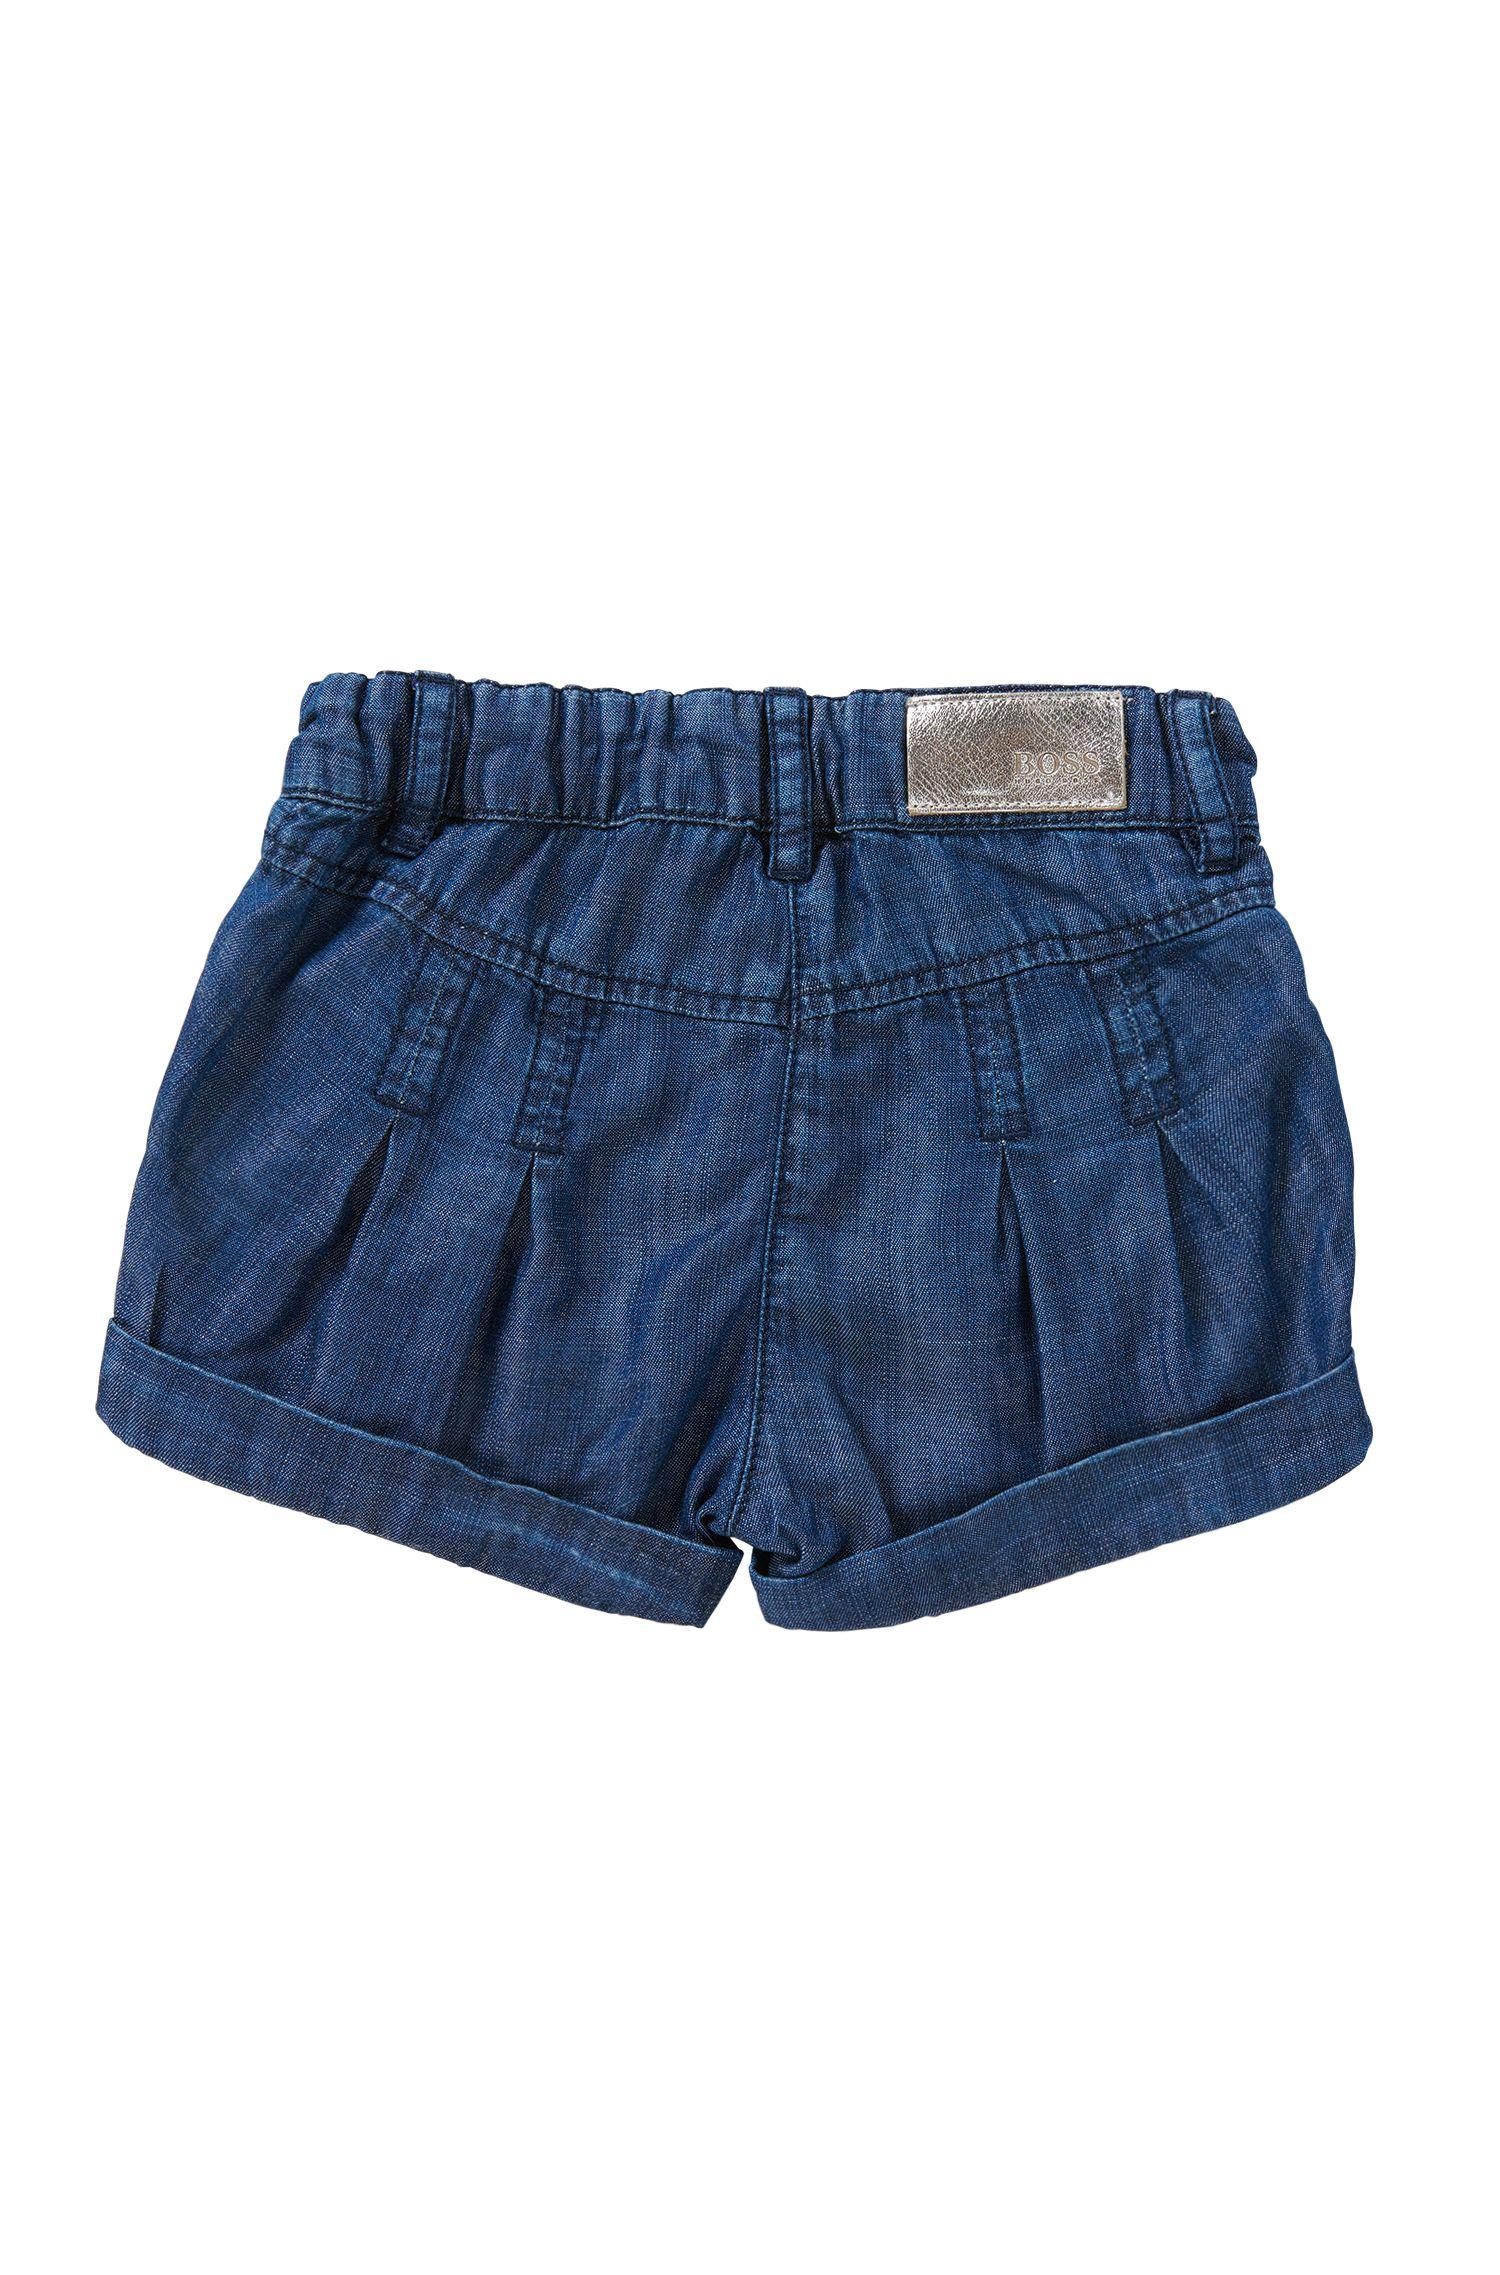 Regular-Fit Baby-Shorts in Denim-Optik mit Elastikbund: 'J04236'